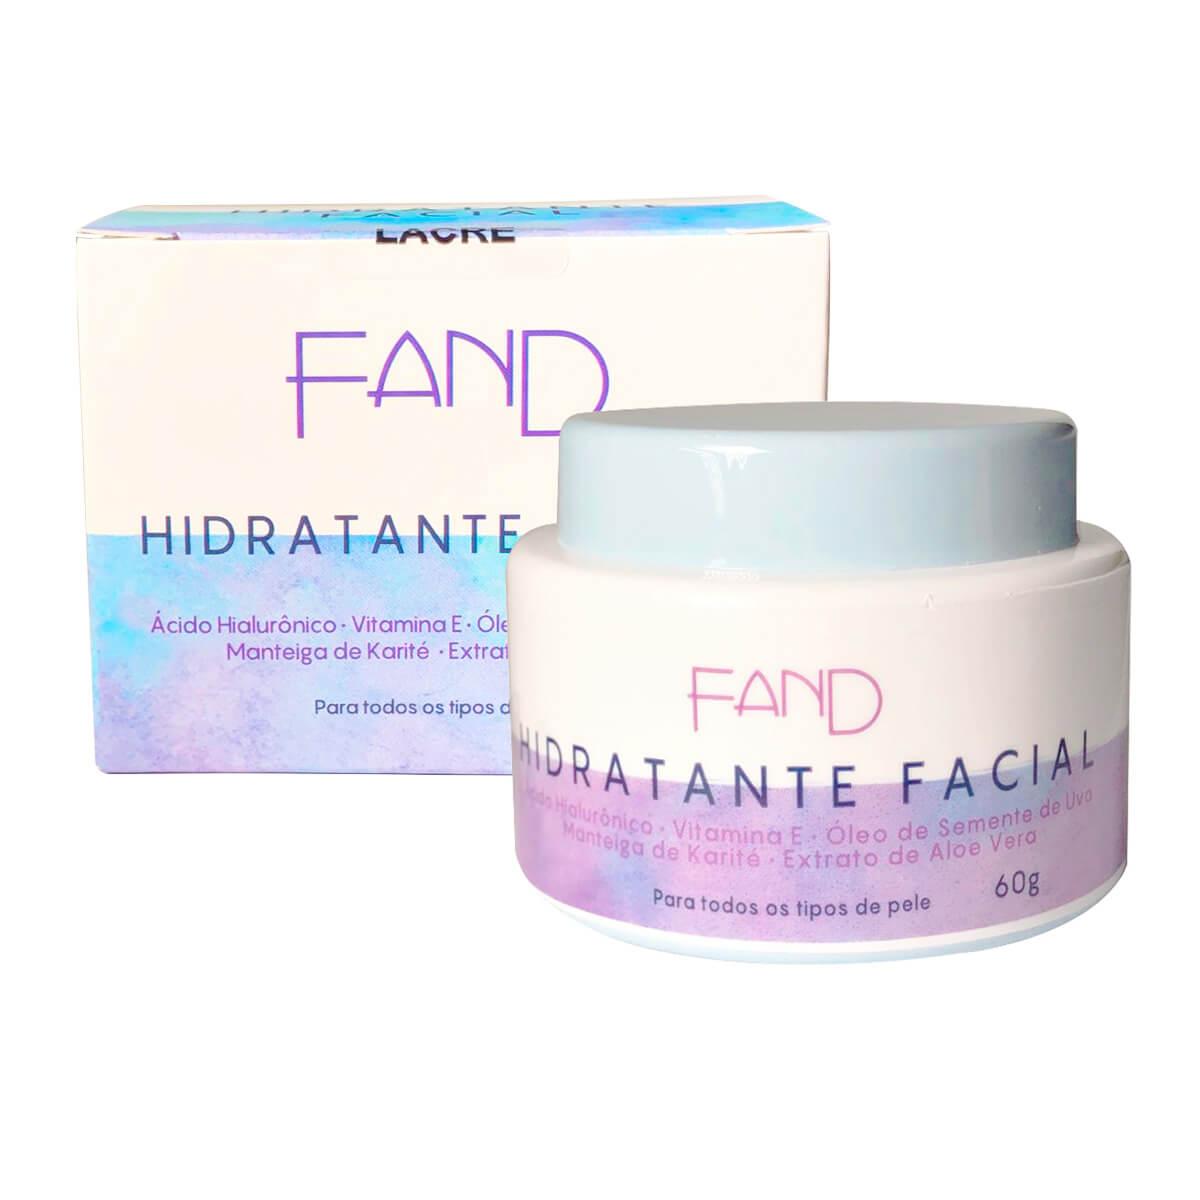 Creme Hidratante Facial Fand Makeup 60g - Todos os tipos de Pele